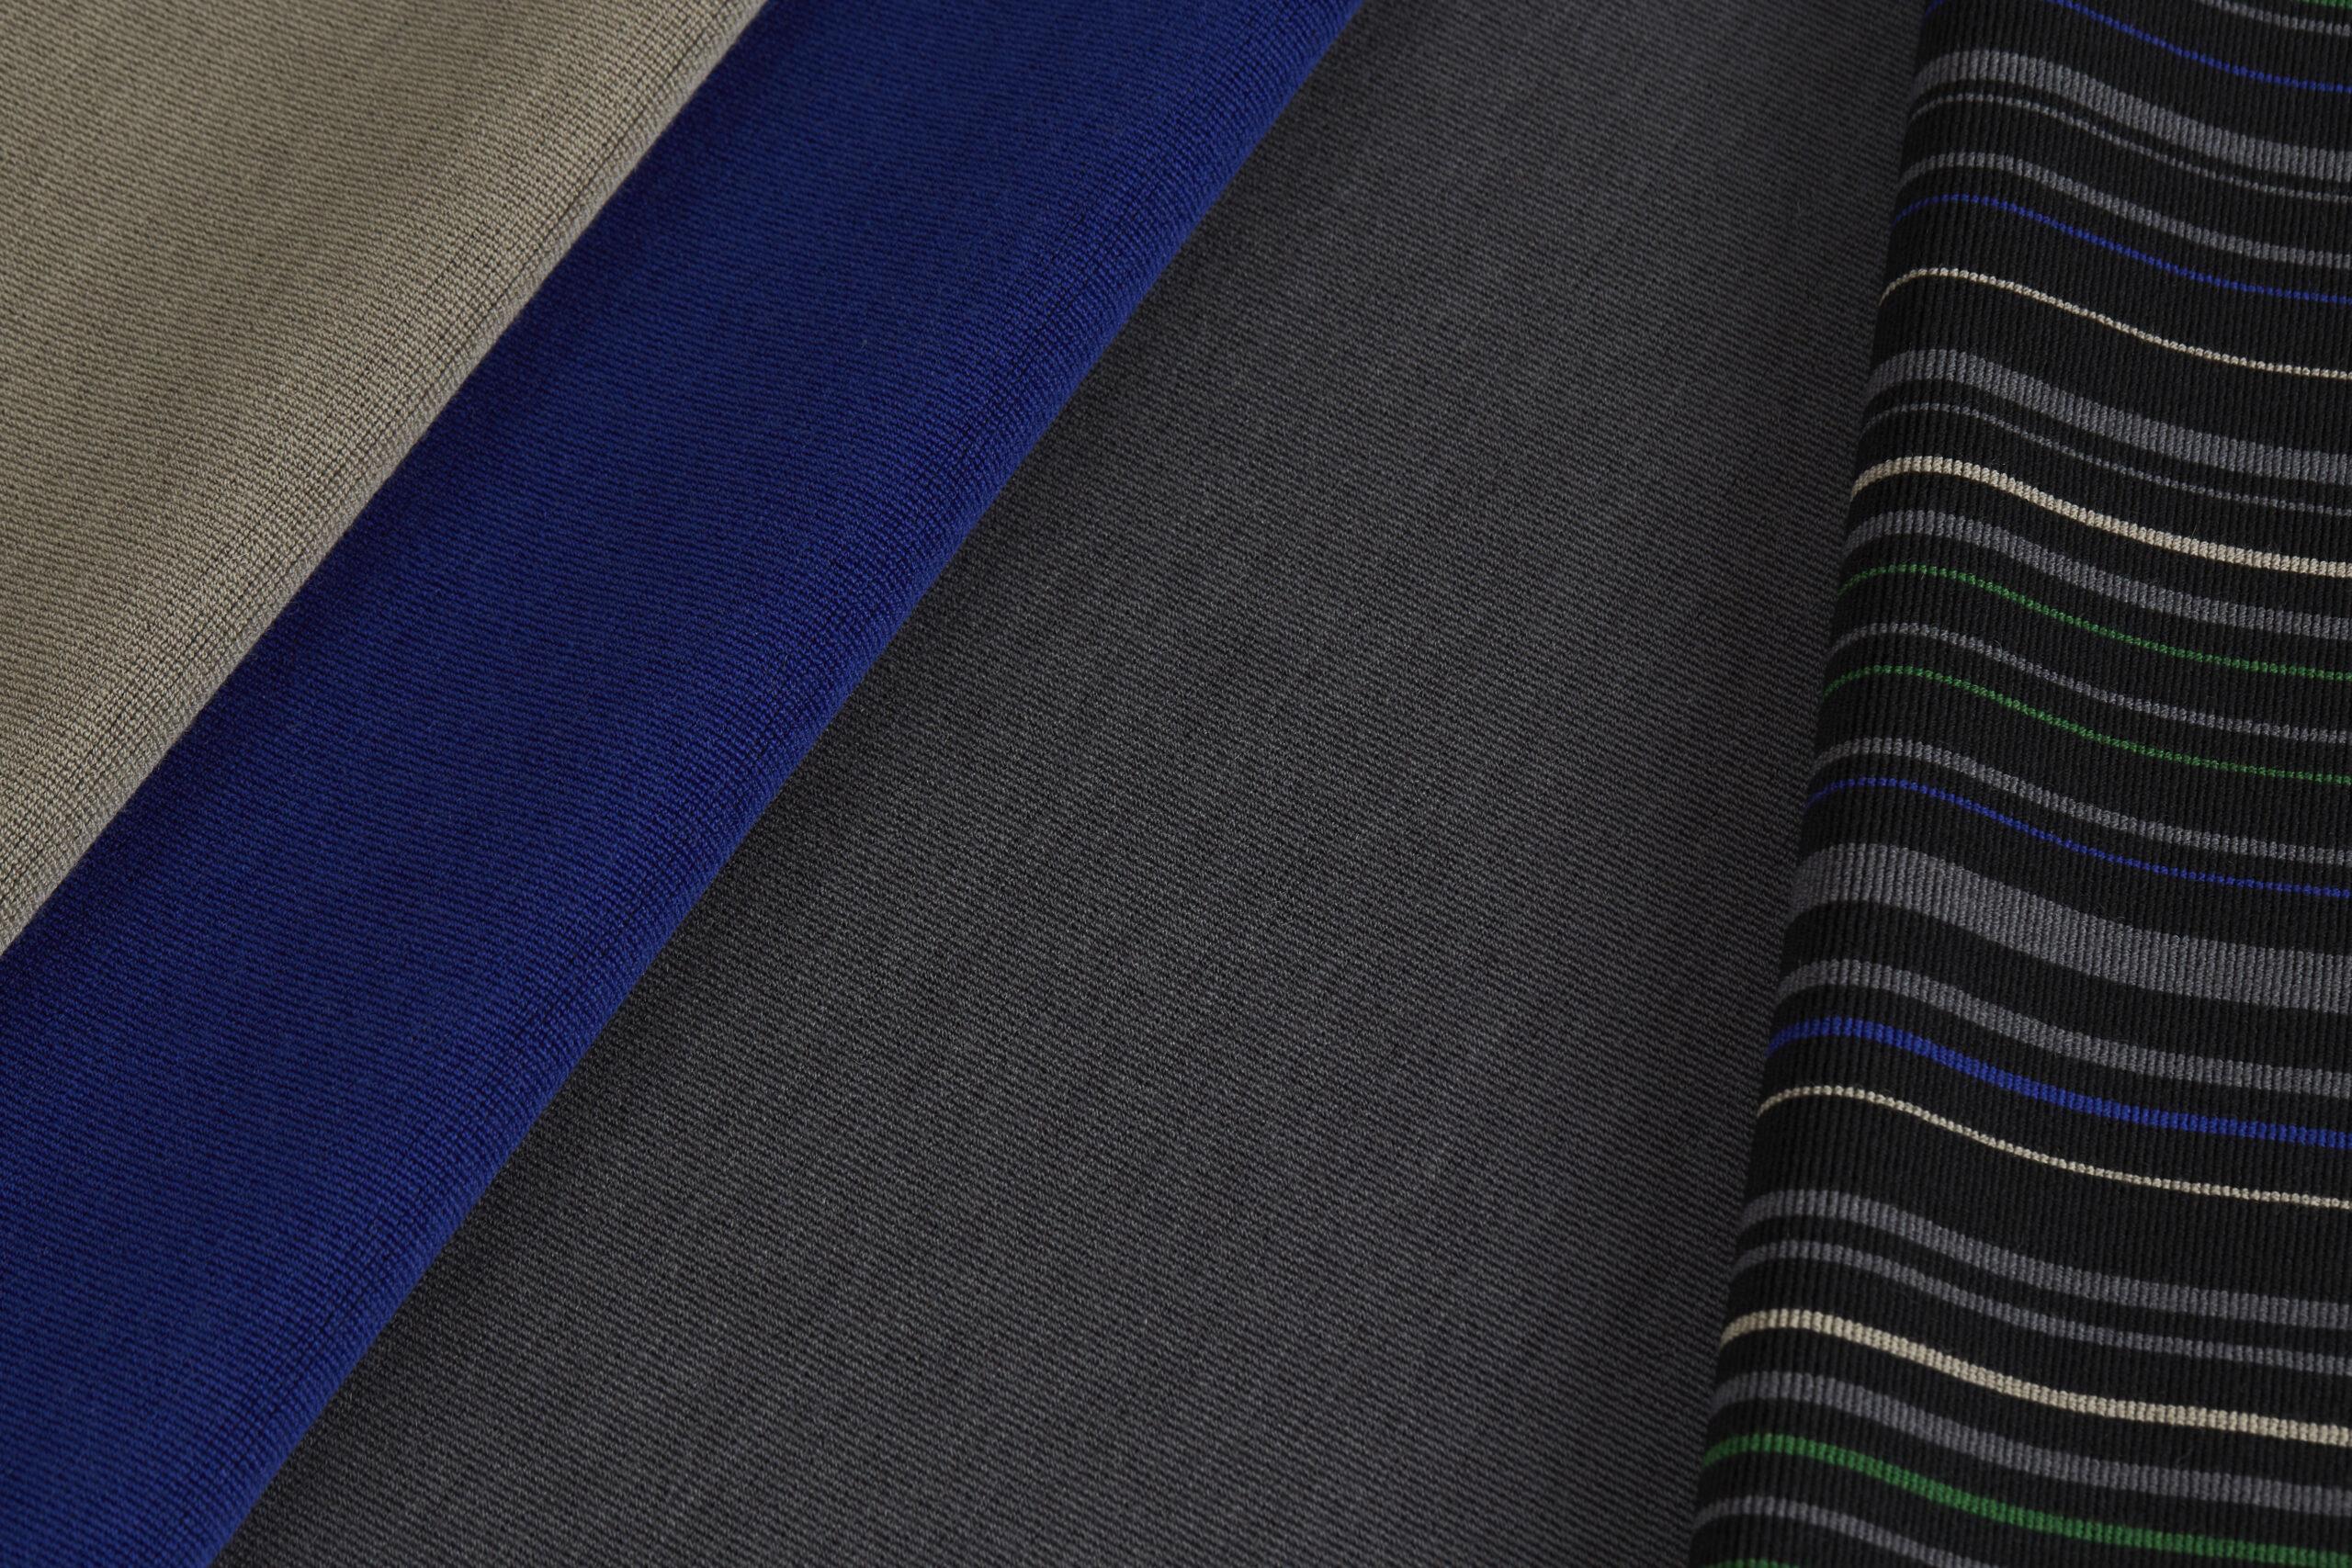 Camira Fabrics HYBRID AUTONOMOUS 002